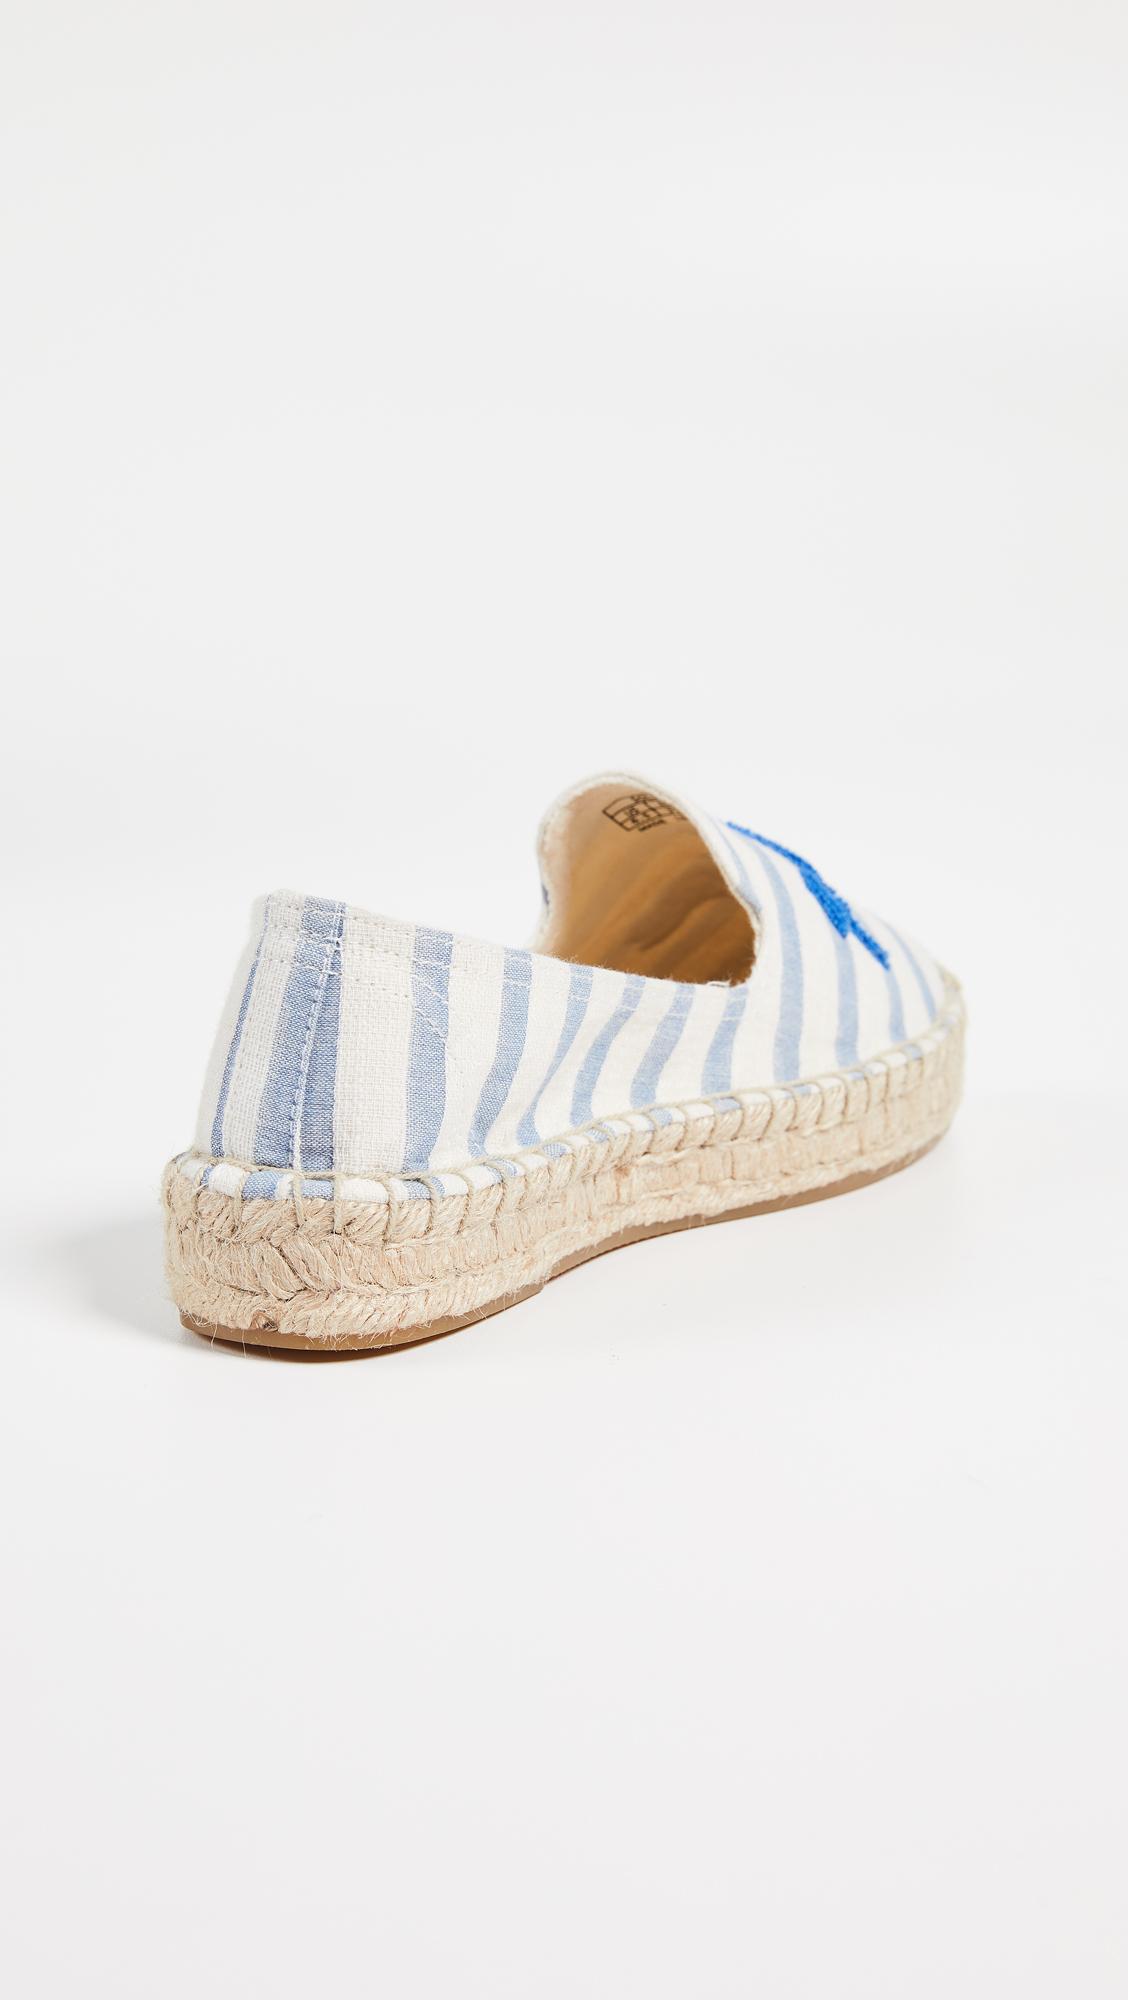 f234dc11f Soludos A La Plage Smoking Slippers | SHOPBOP